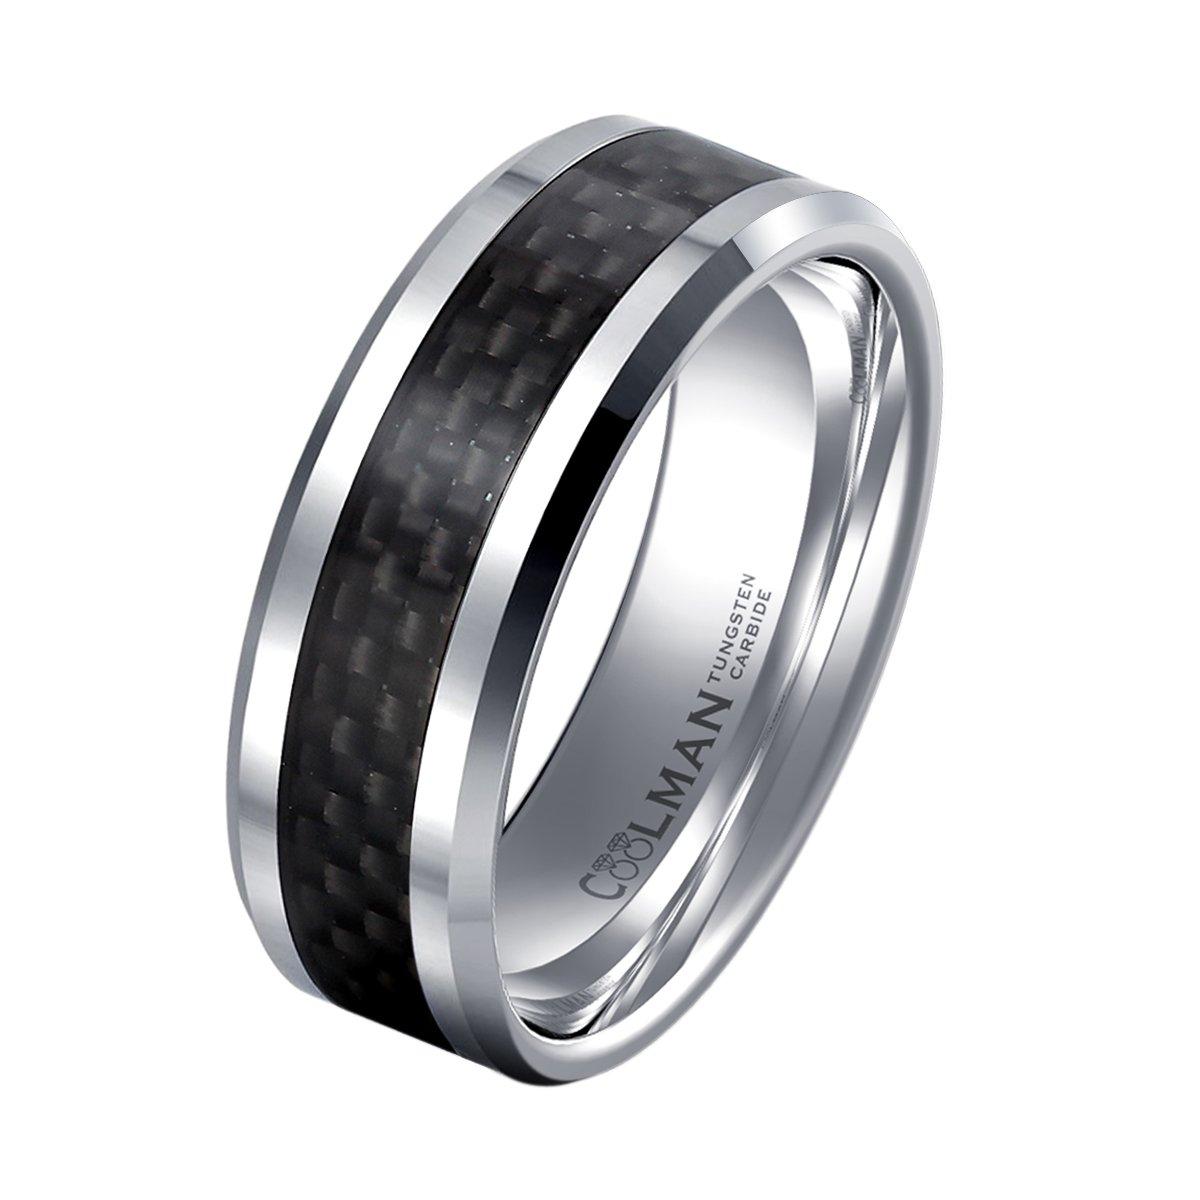 COOLMAN Tungsten Wedding Rings for Men Black Carbon Fiber Inlaid Men's Rings 8MM Comfort Fit Ring